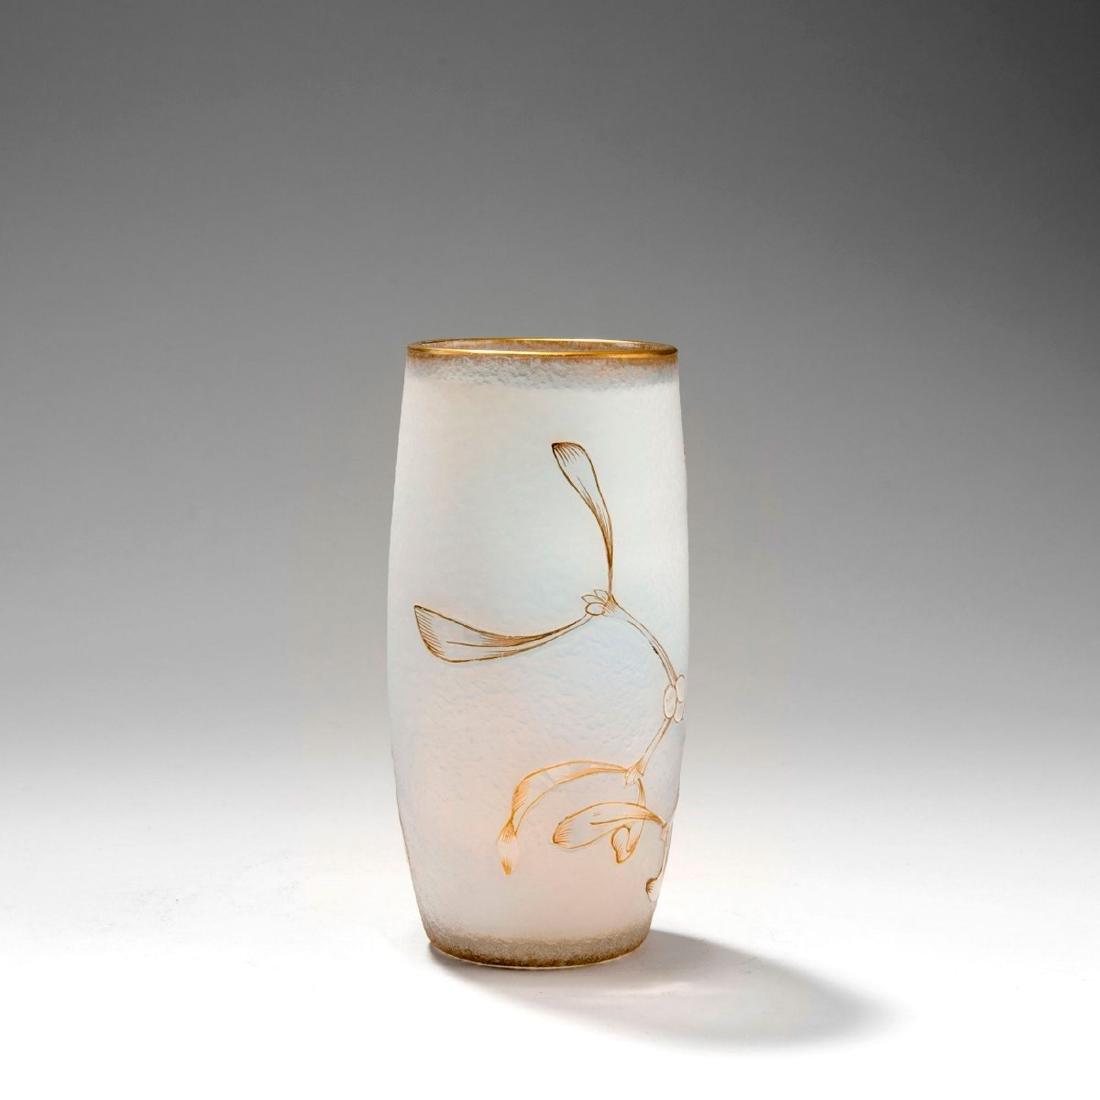 Small 'Gui' vase, 1895 - 2